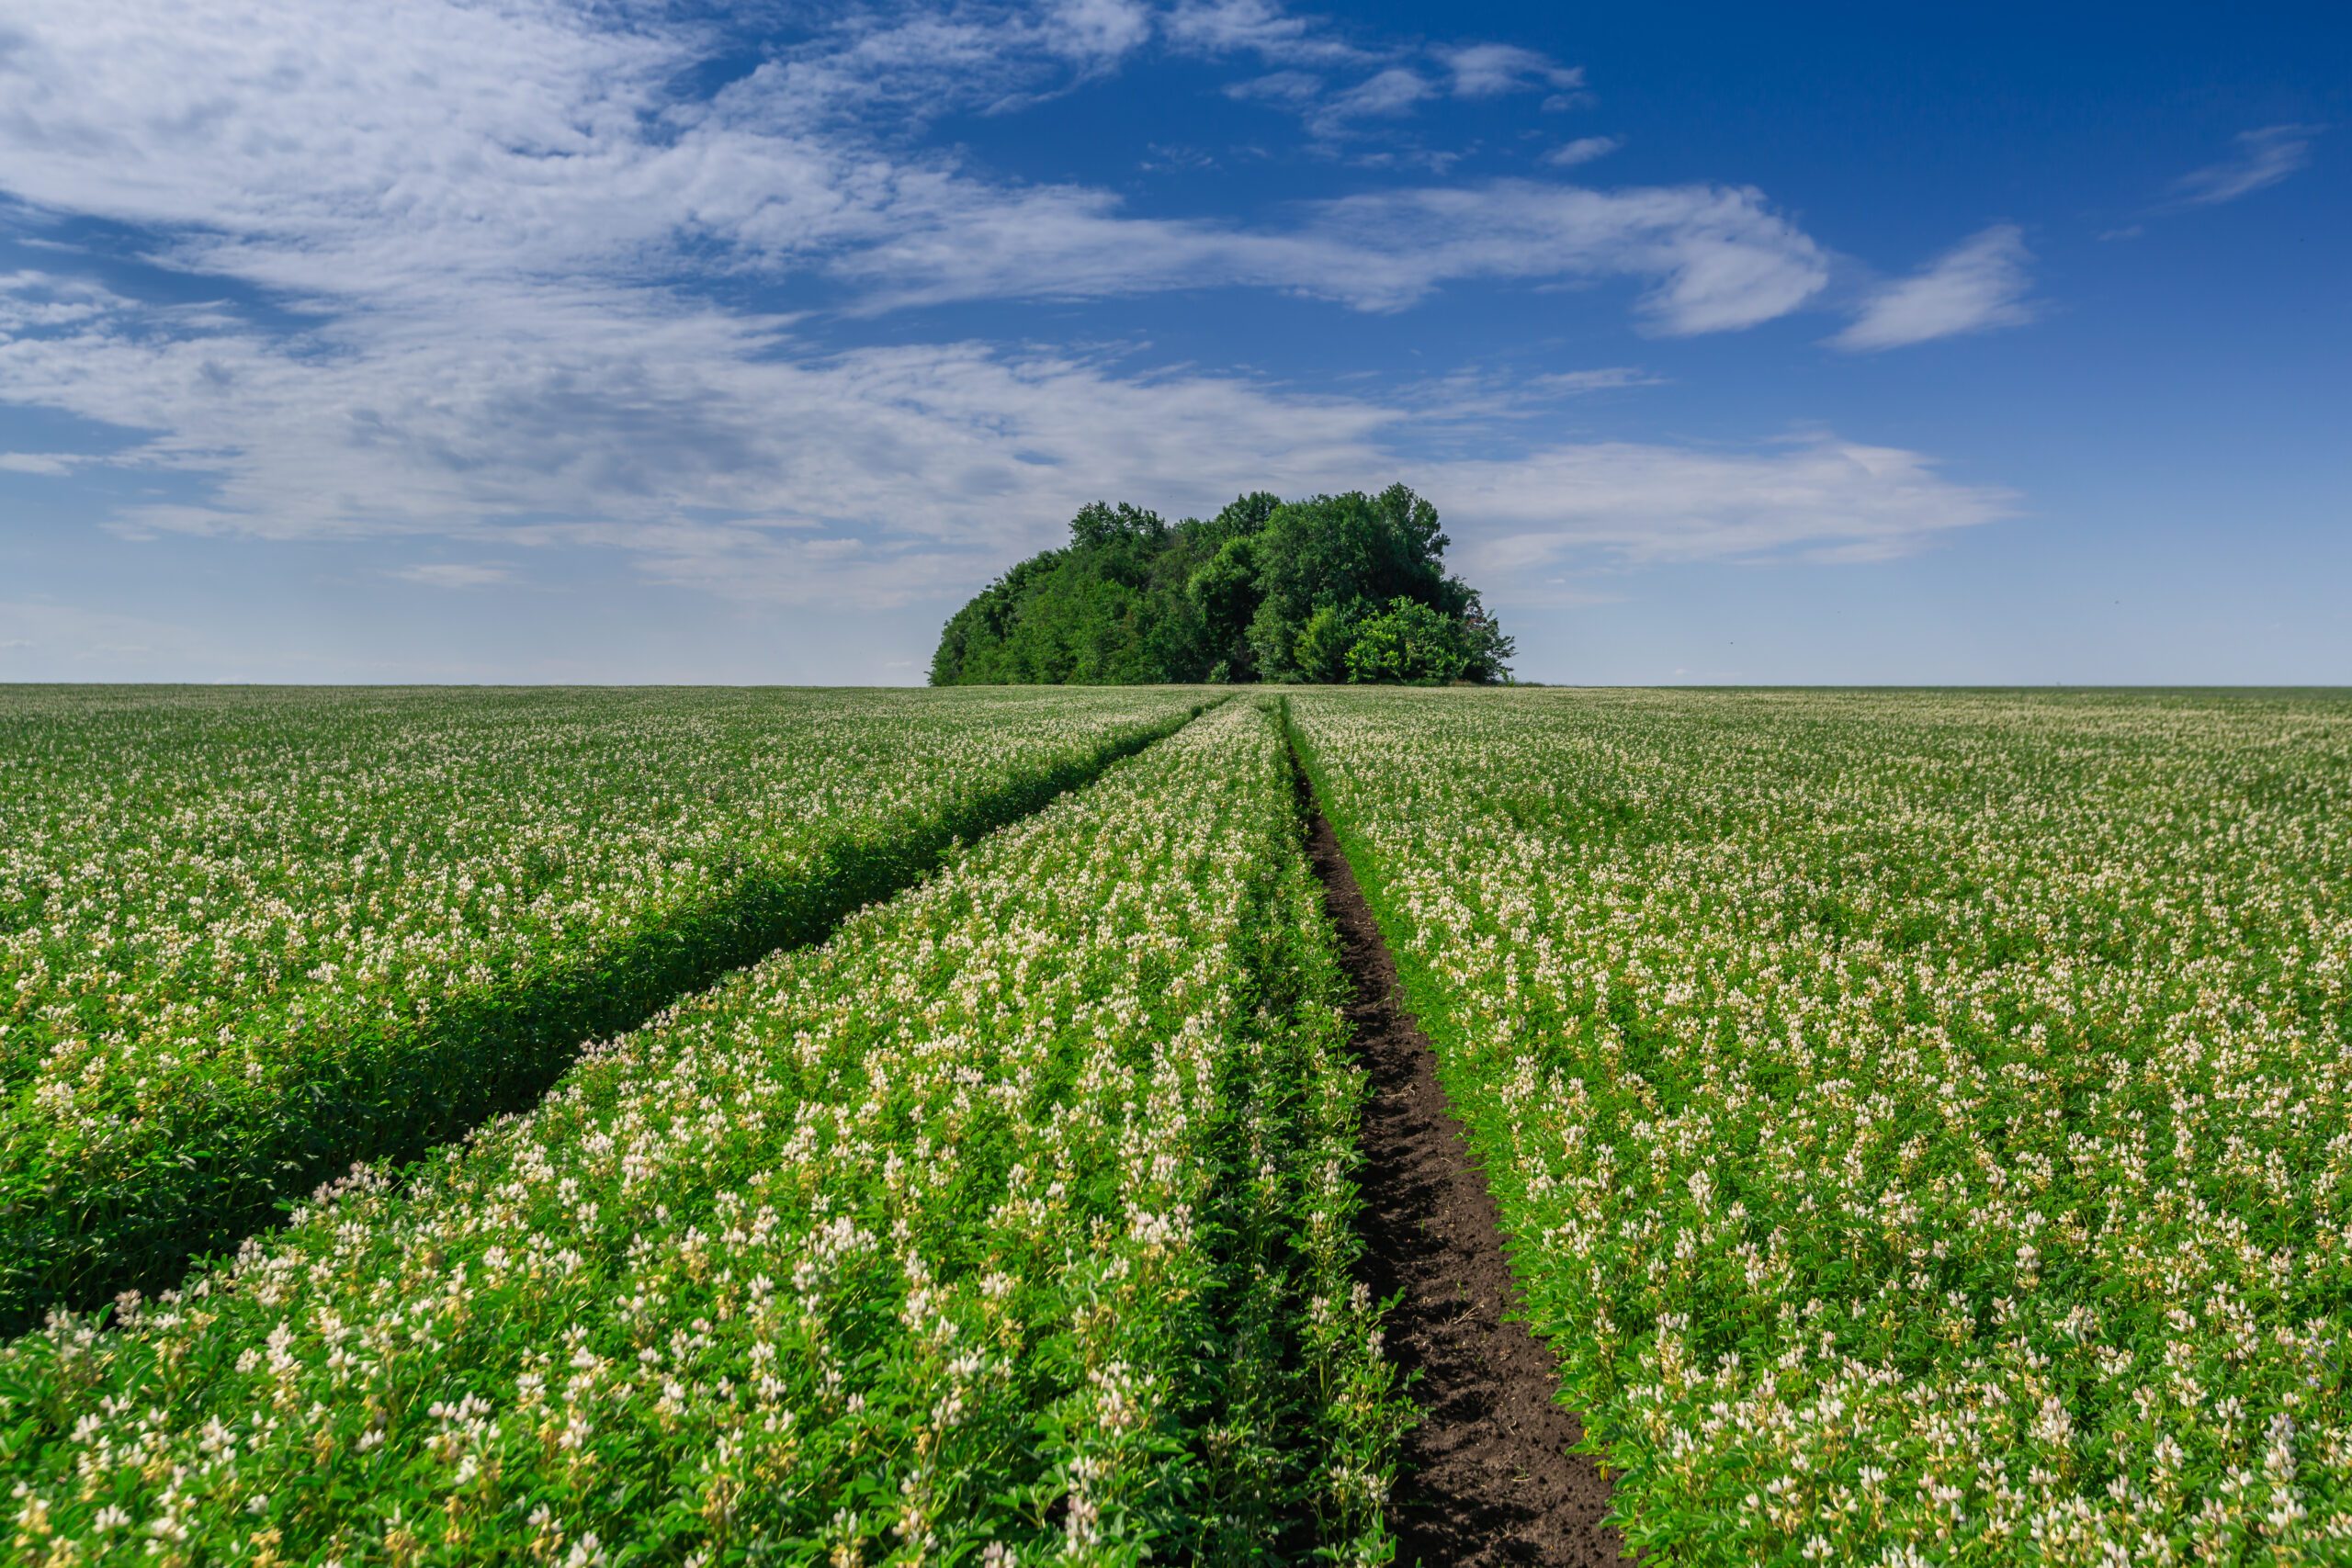 '100.000 hectare Hollands eiwitgewas is ambitieus'